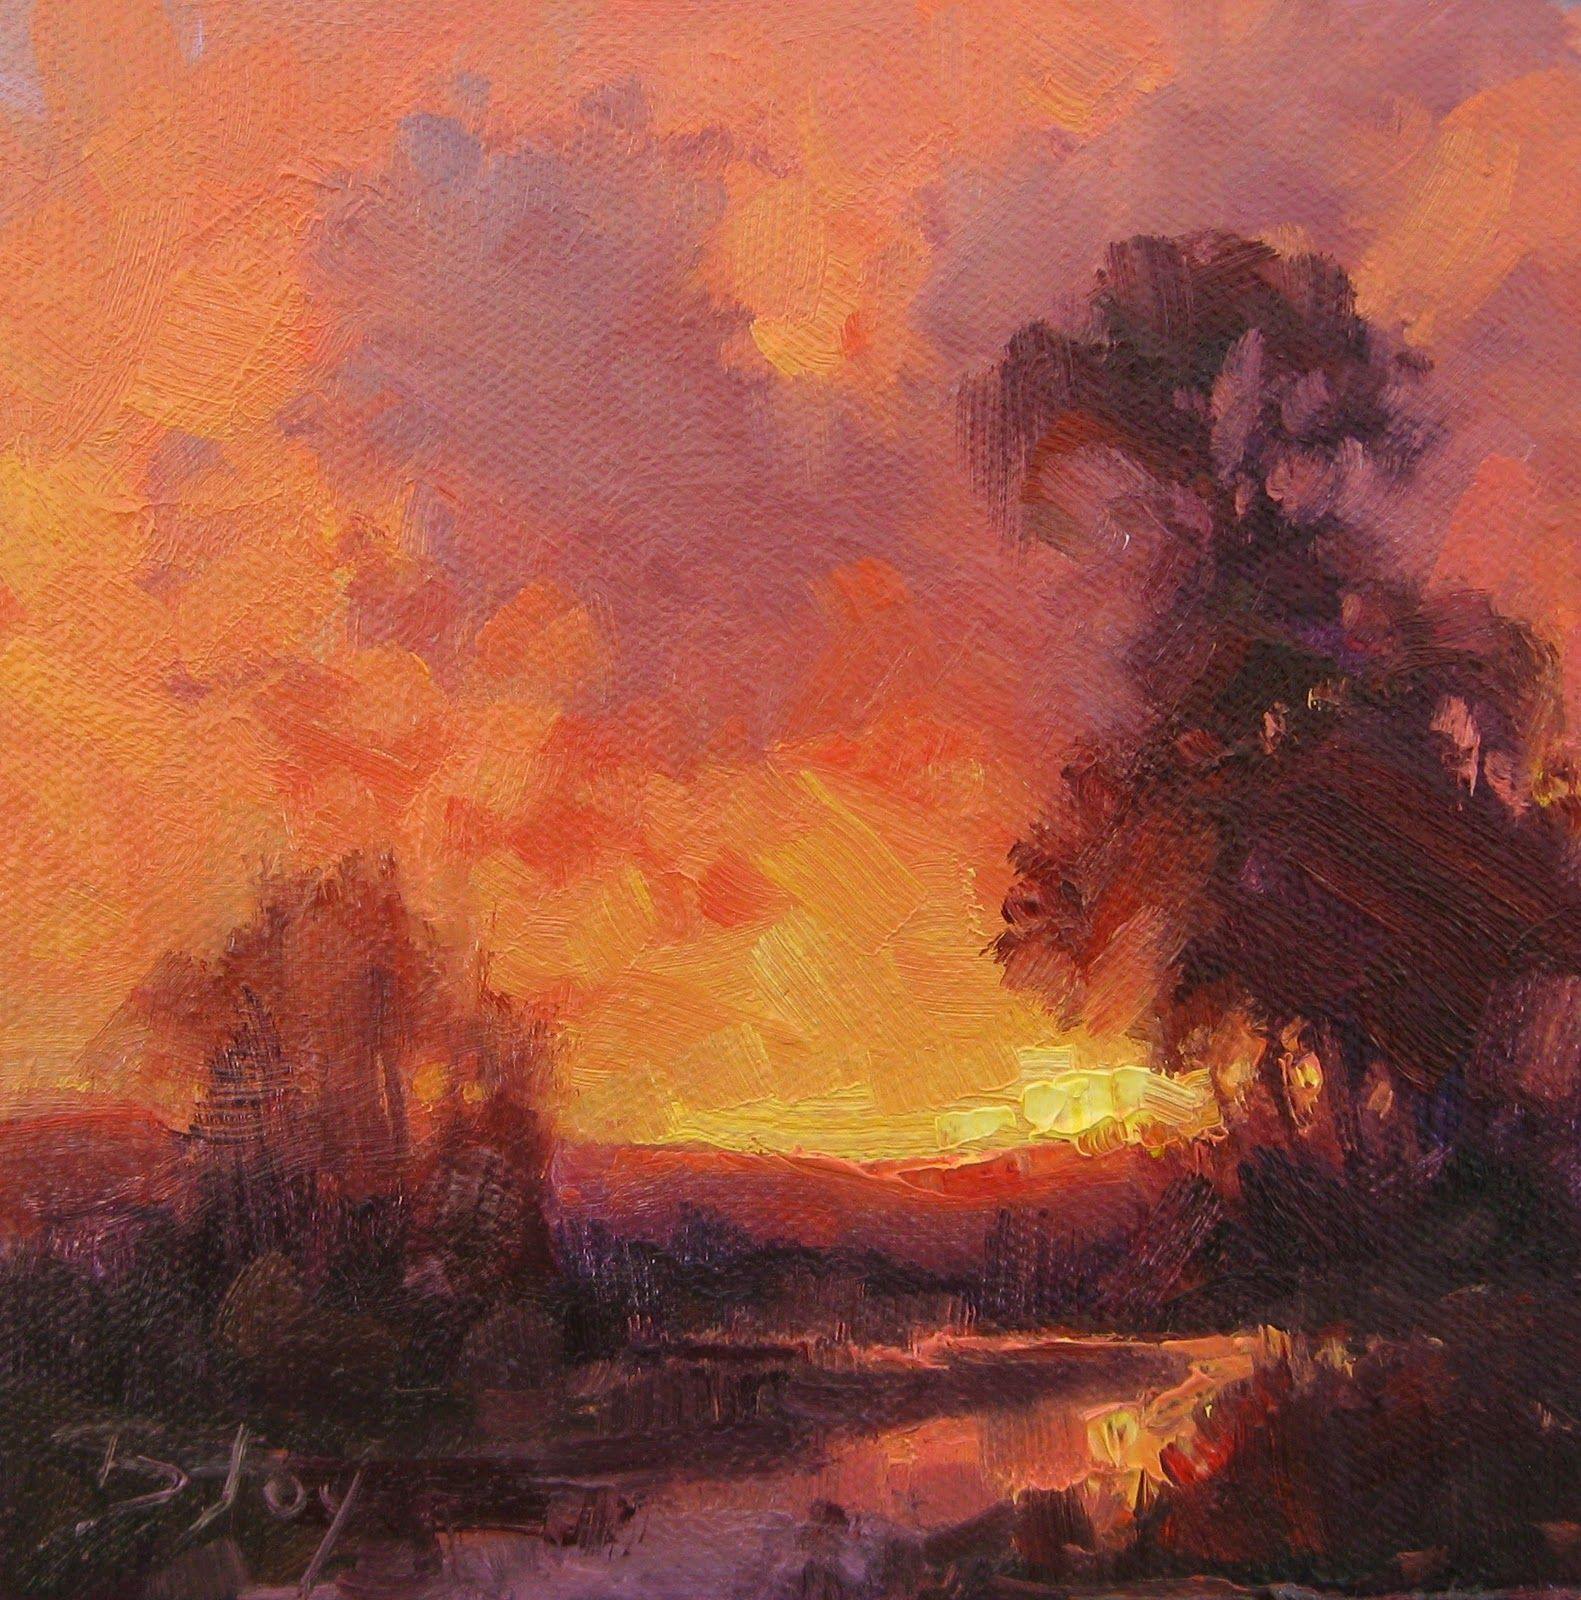 Becky Joy Paintings Palette Knife Painters #31 Sunset